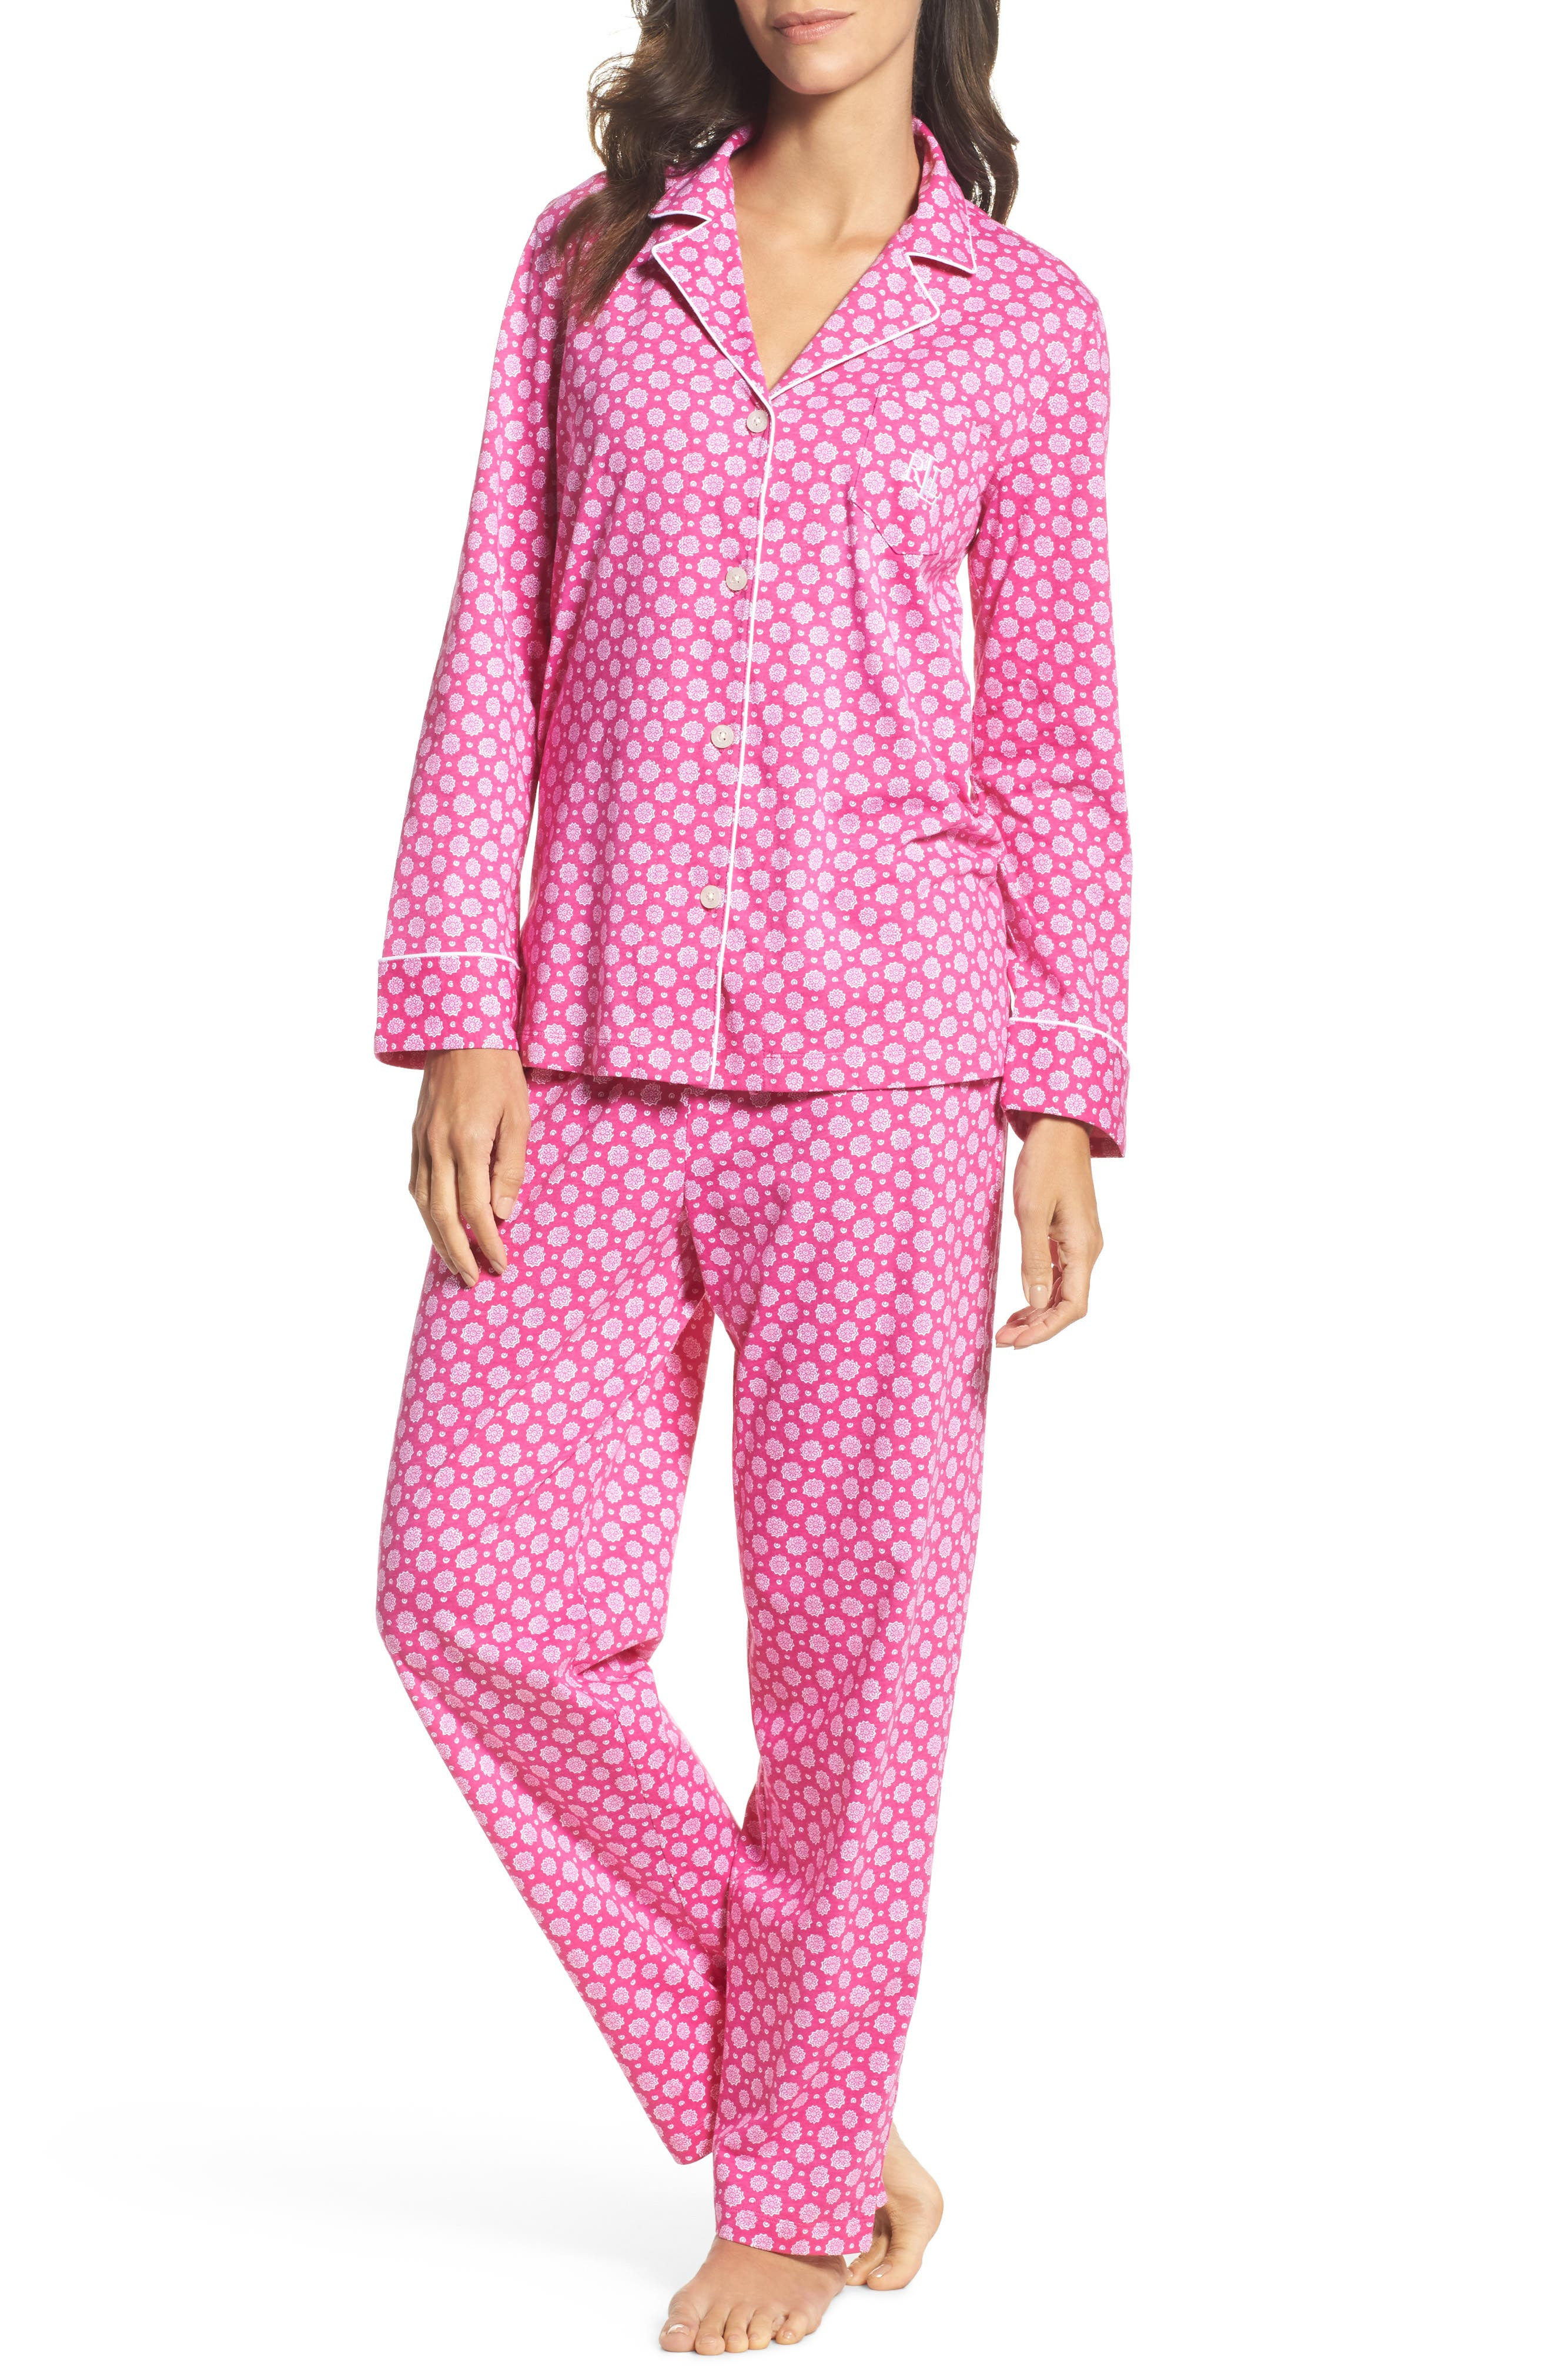 Notch Collar Pajamas,                             Main thumbnail 1, color,                             Pink Floral